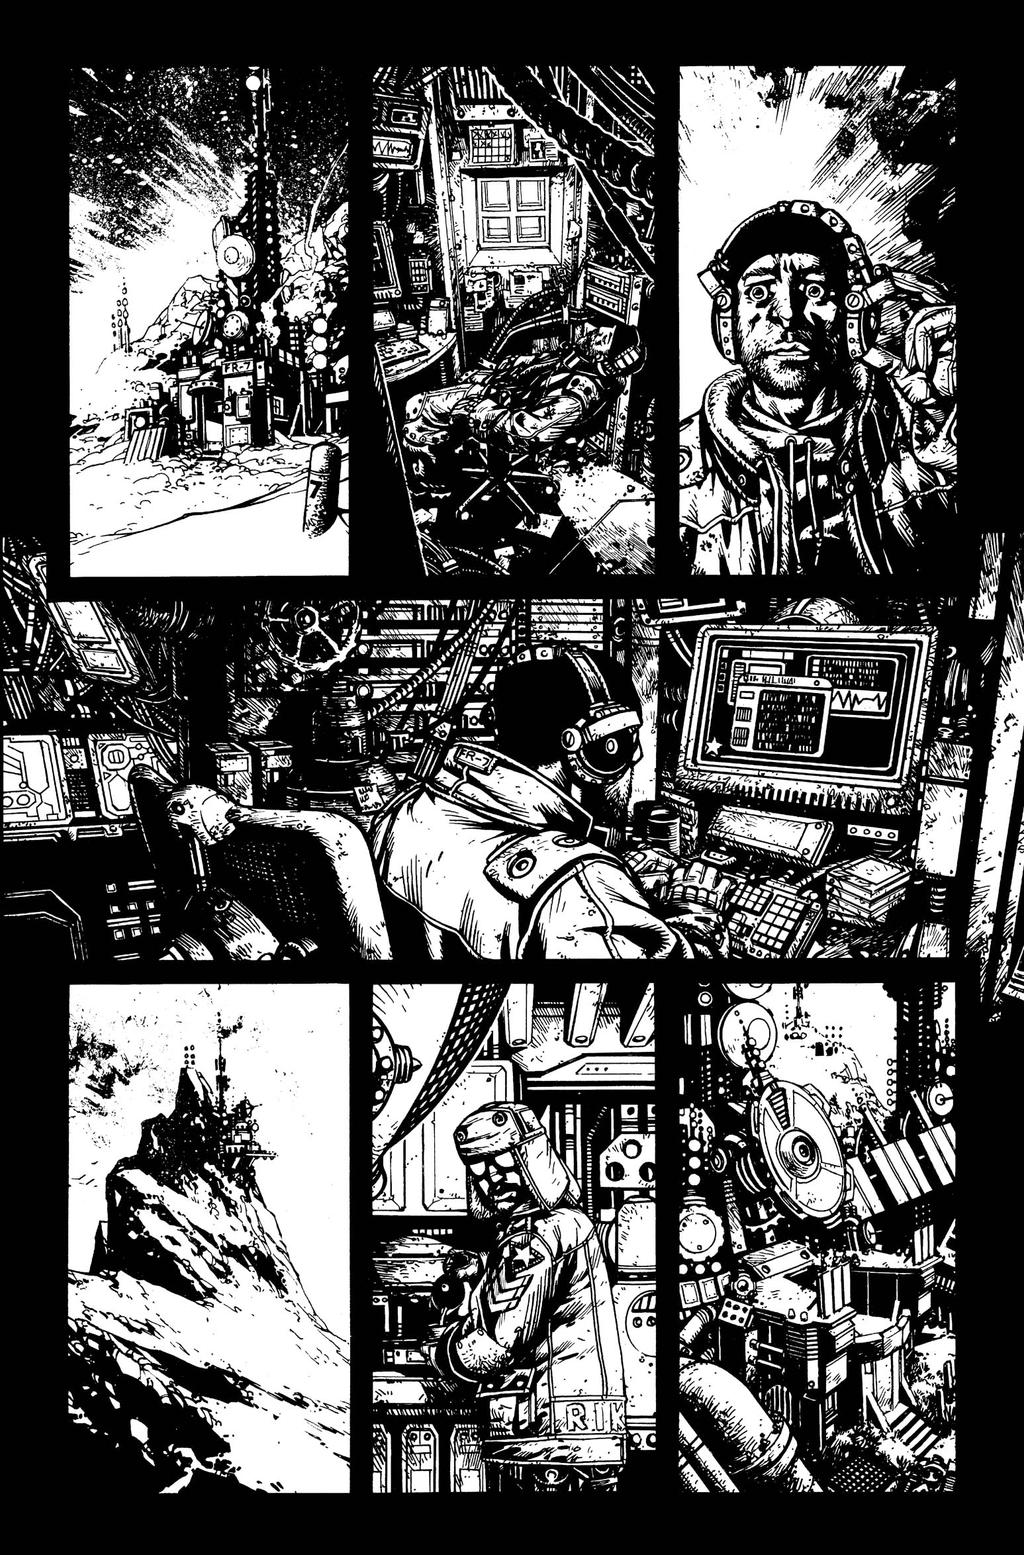 Wild Blue Yonder Issue 2 Page 24 by Spacefriend-KRUNK